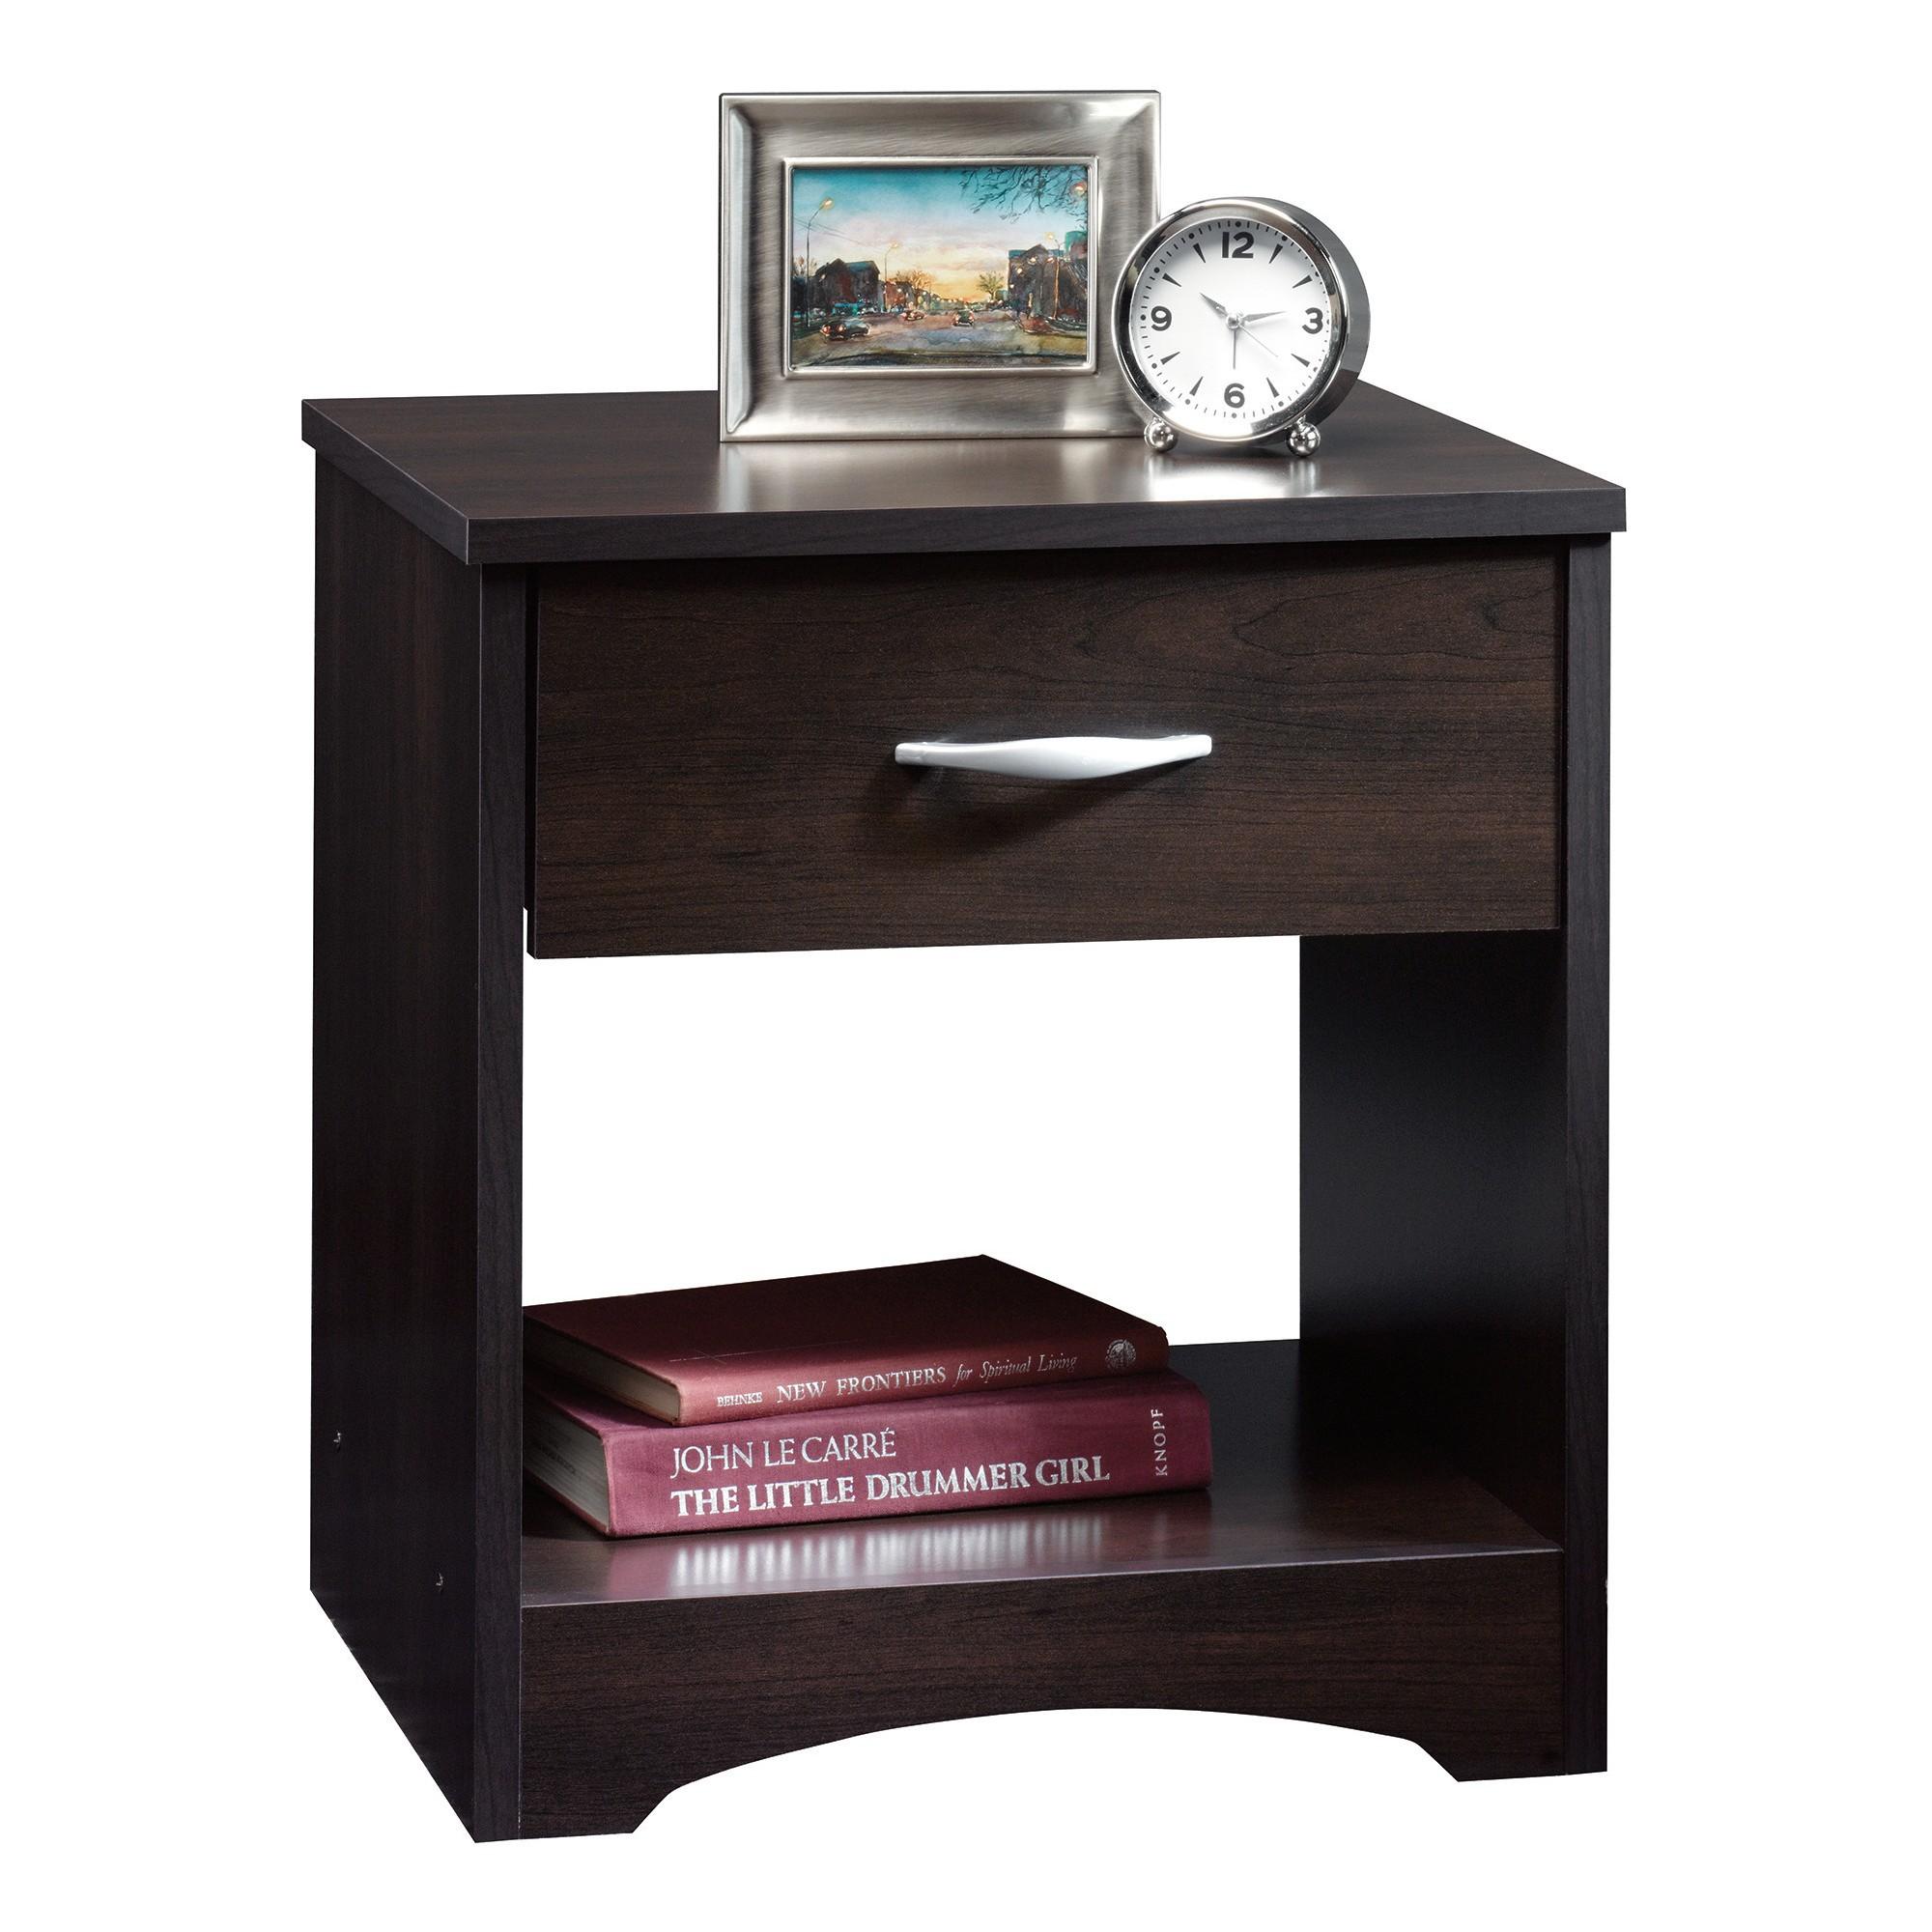 Beginnings Nightstand with Drawer & Open Shelf Cinnamon